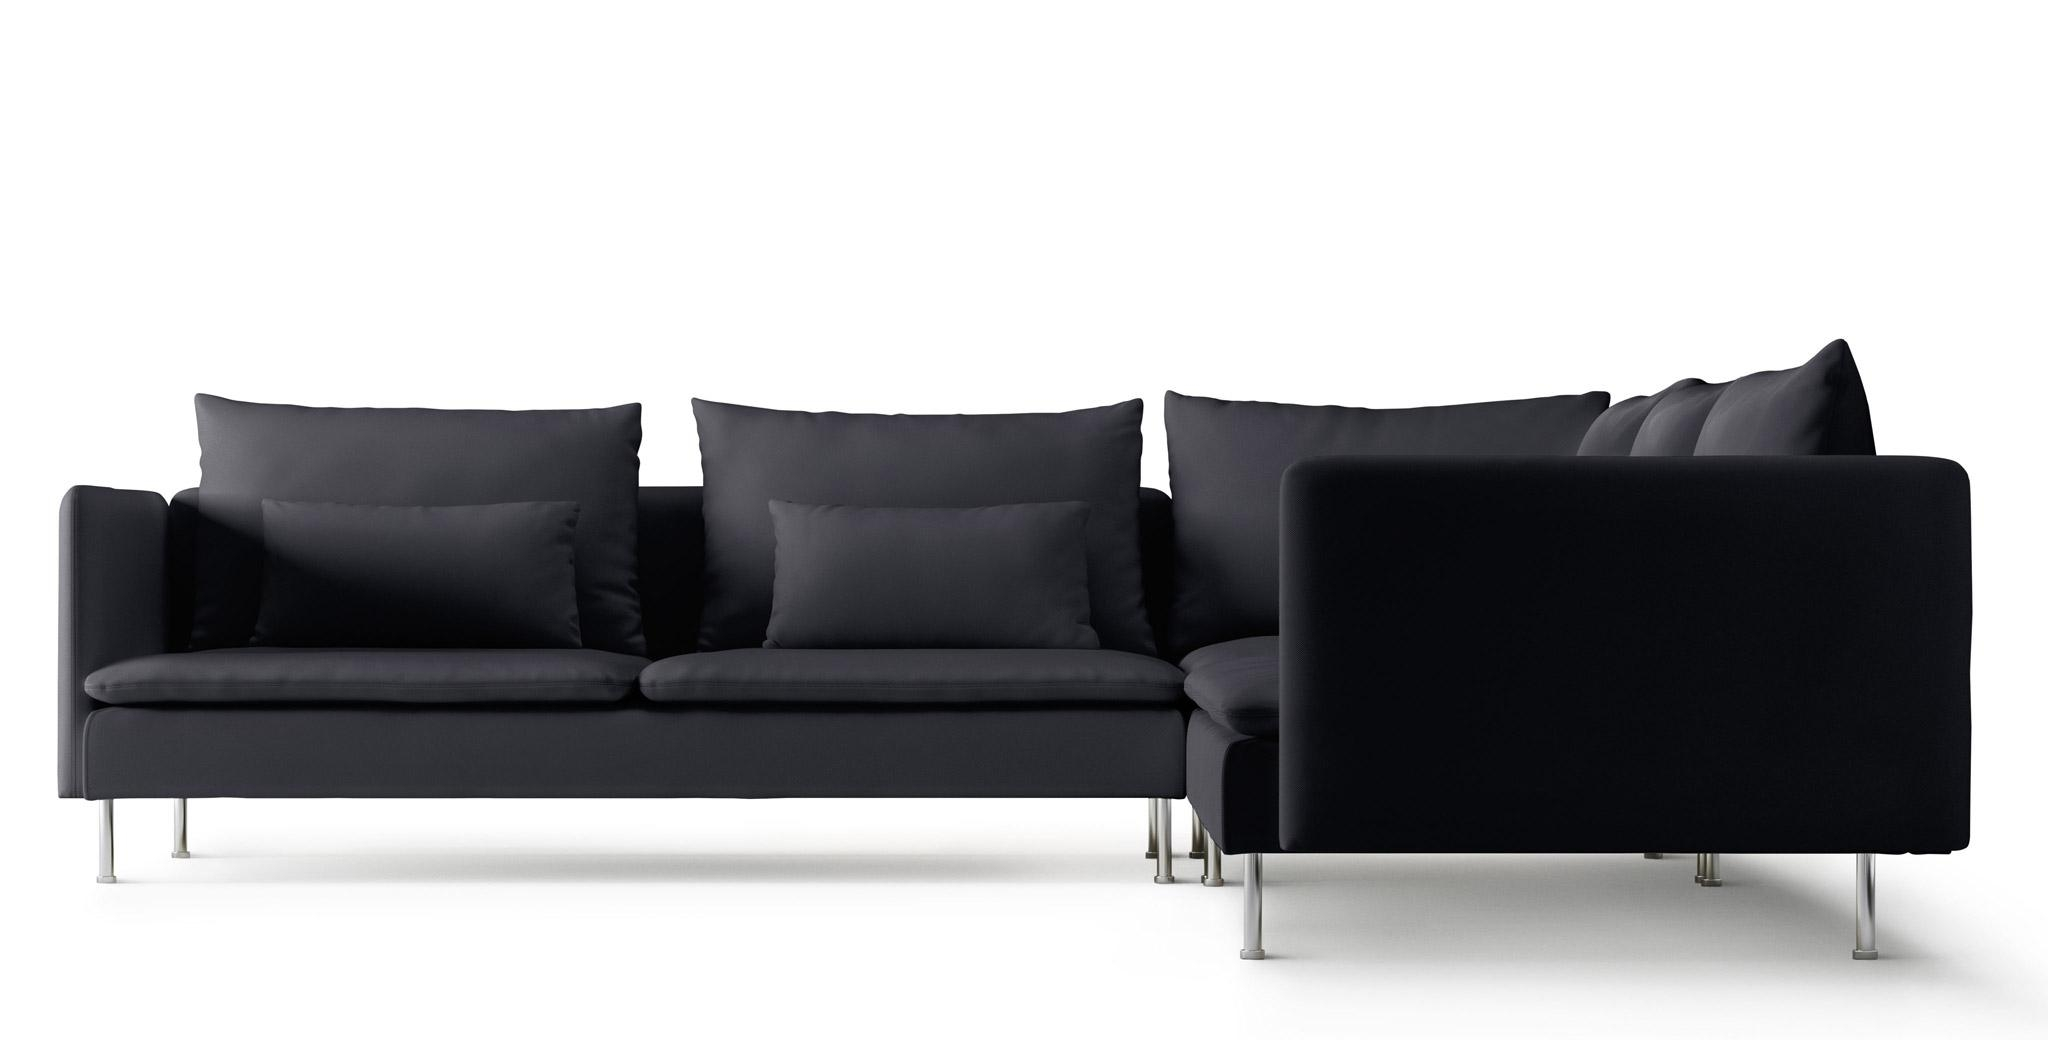 Fabric Corner Sofas | Ikea Intended For Black Corner Sofas (Image 11 of 20)